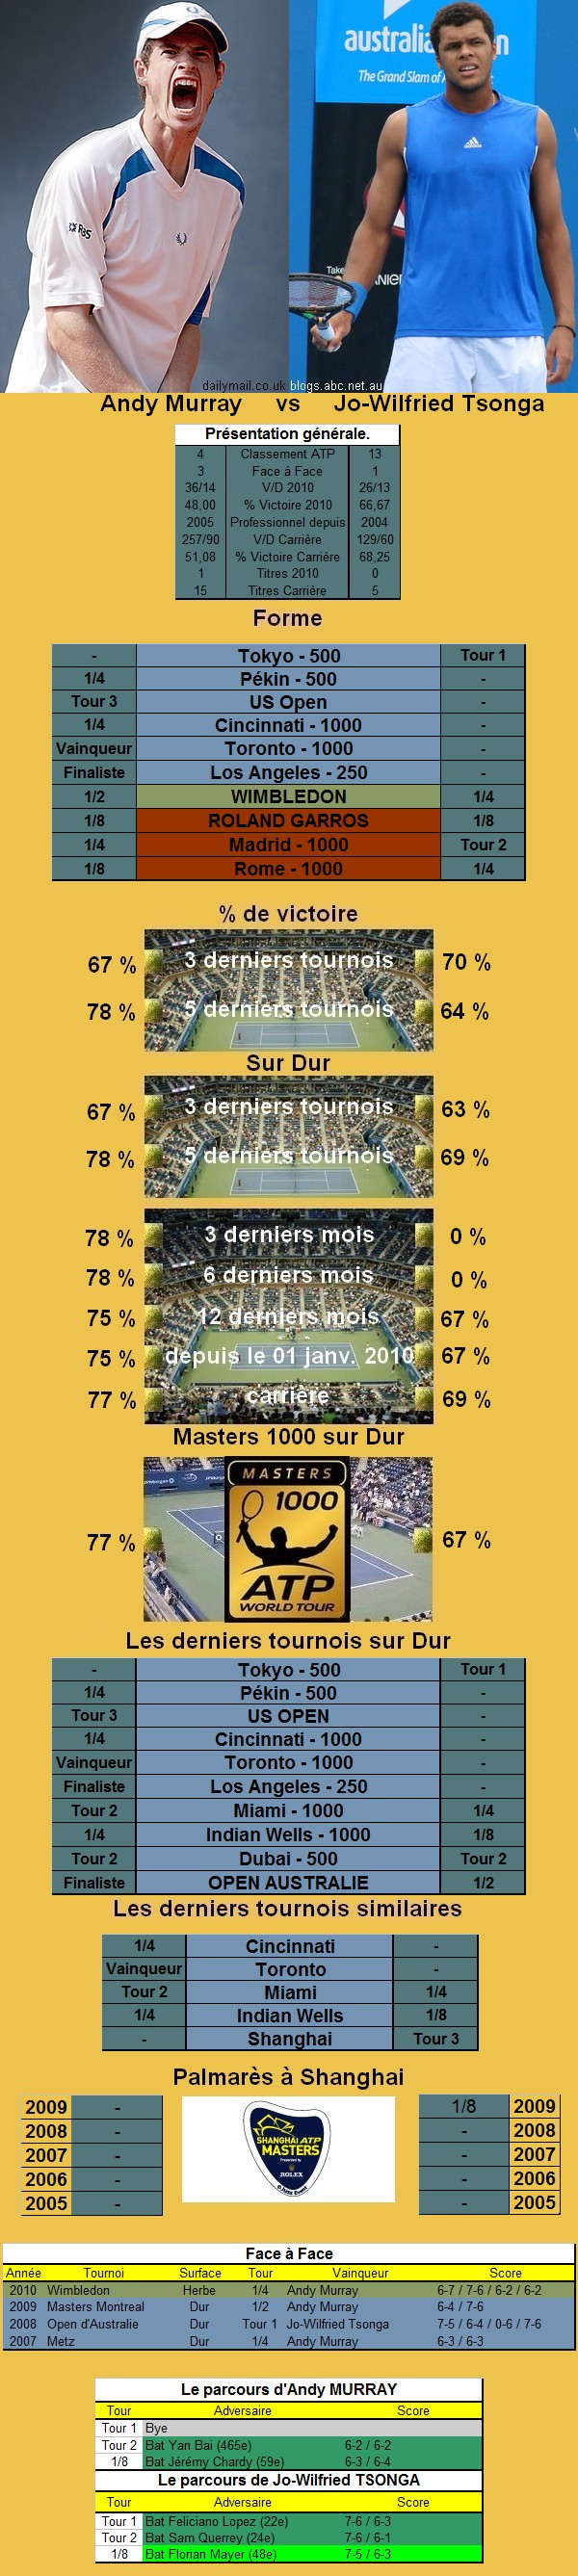 Statistiques tennis de Murray contre Tsonga à Shanghai